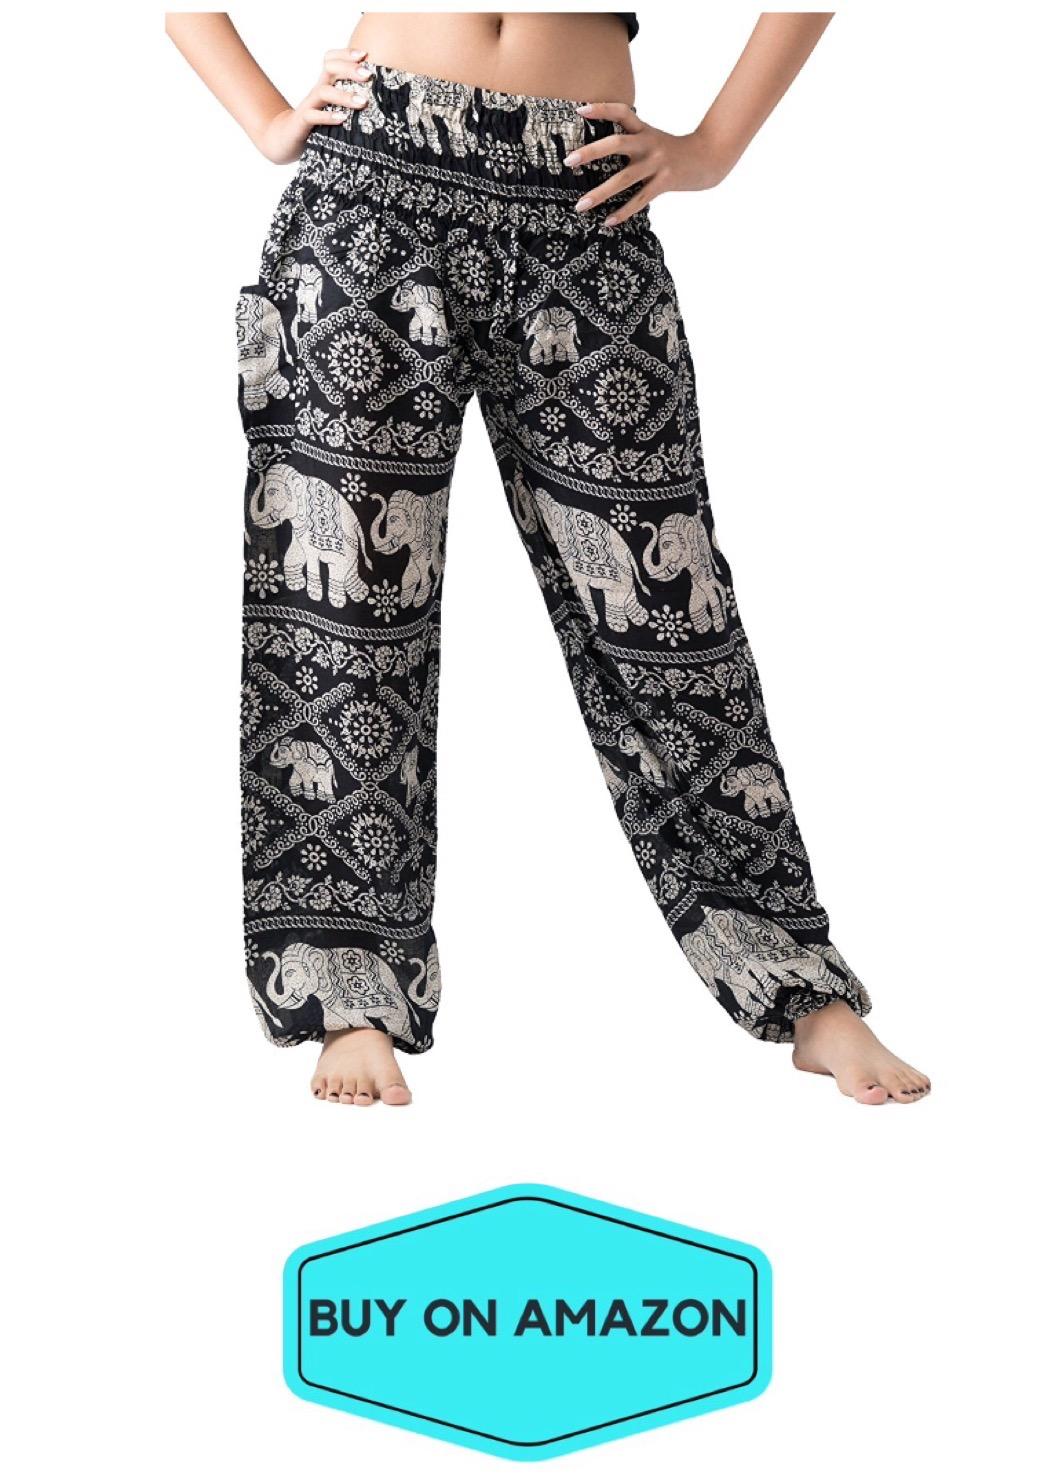 Elephant Yoga Pants